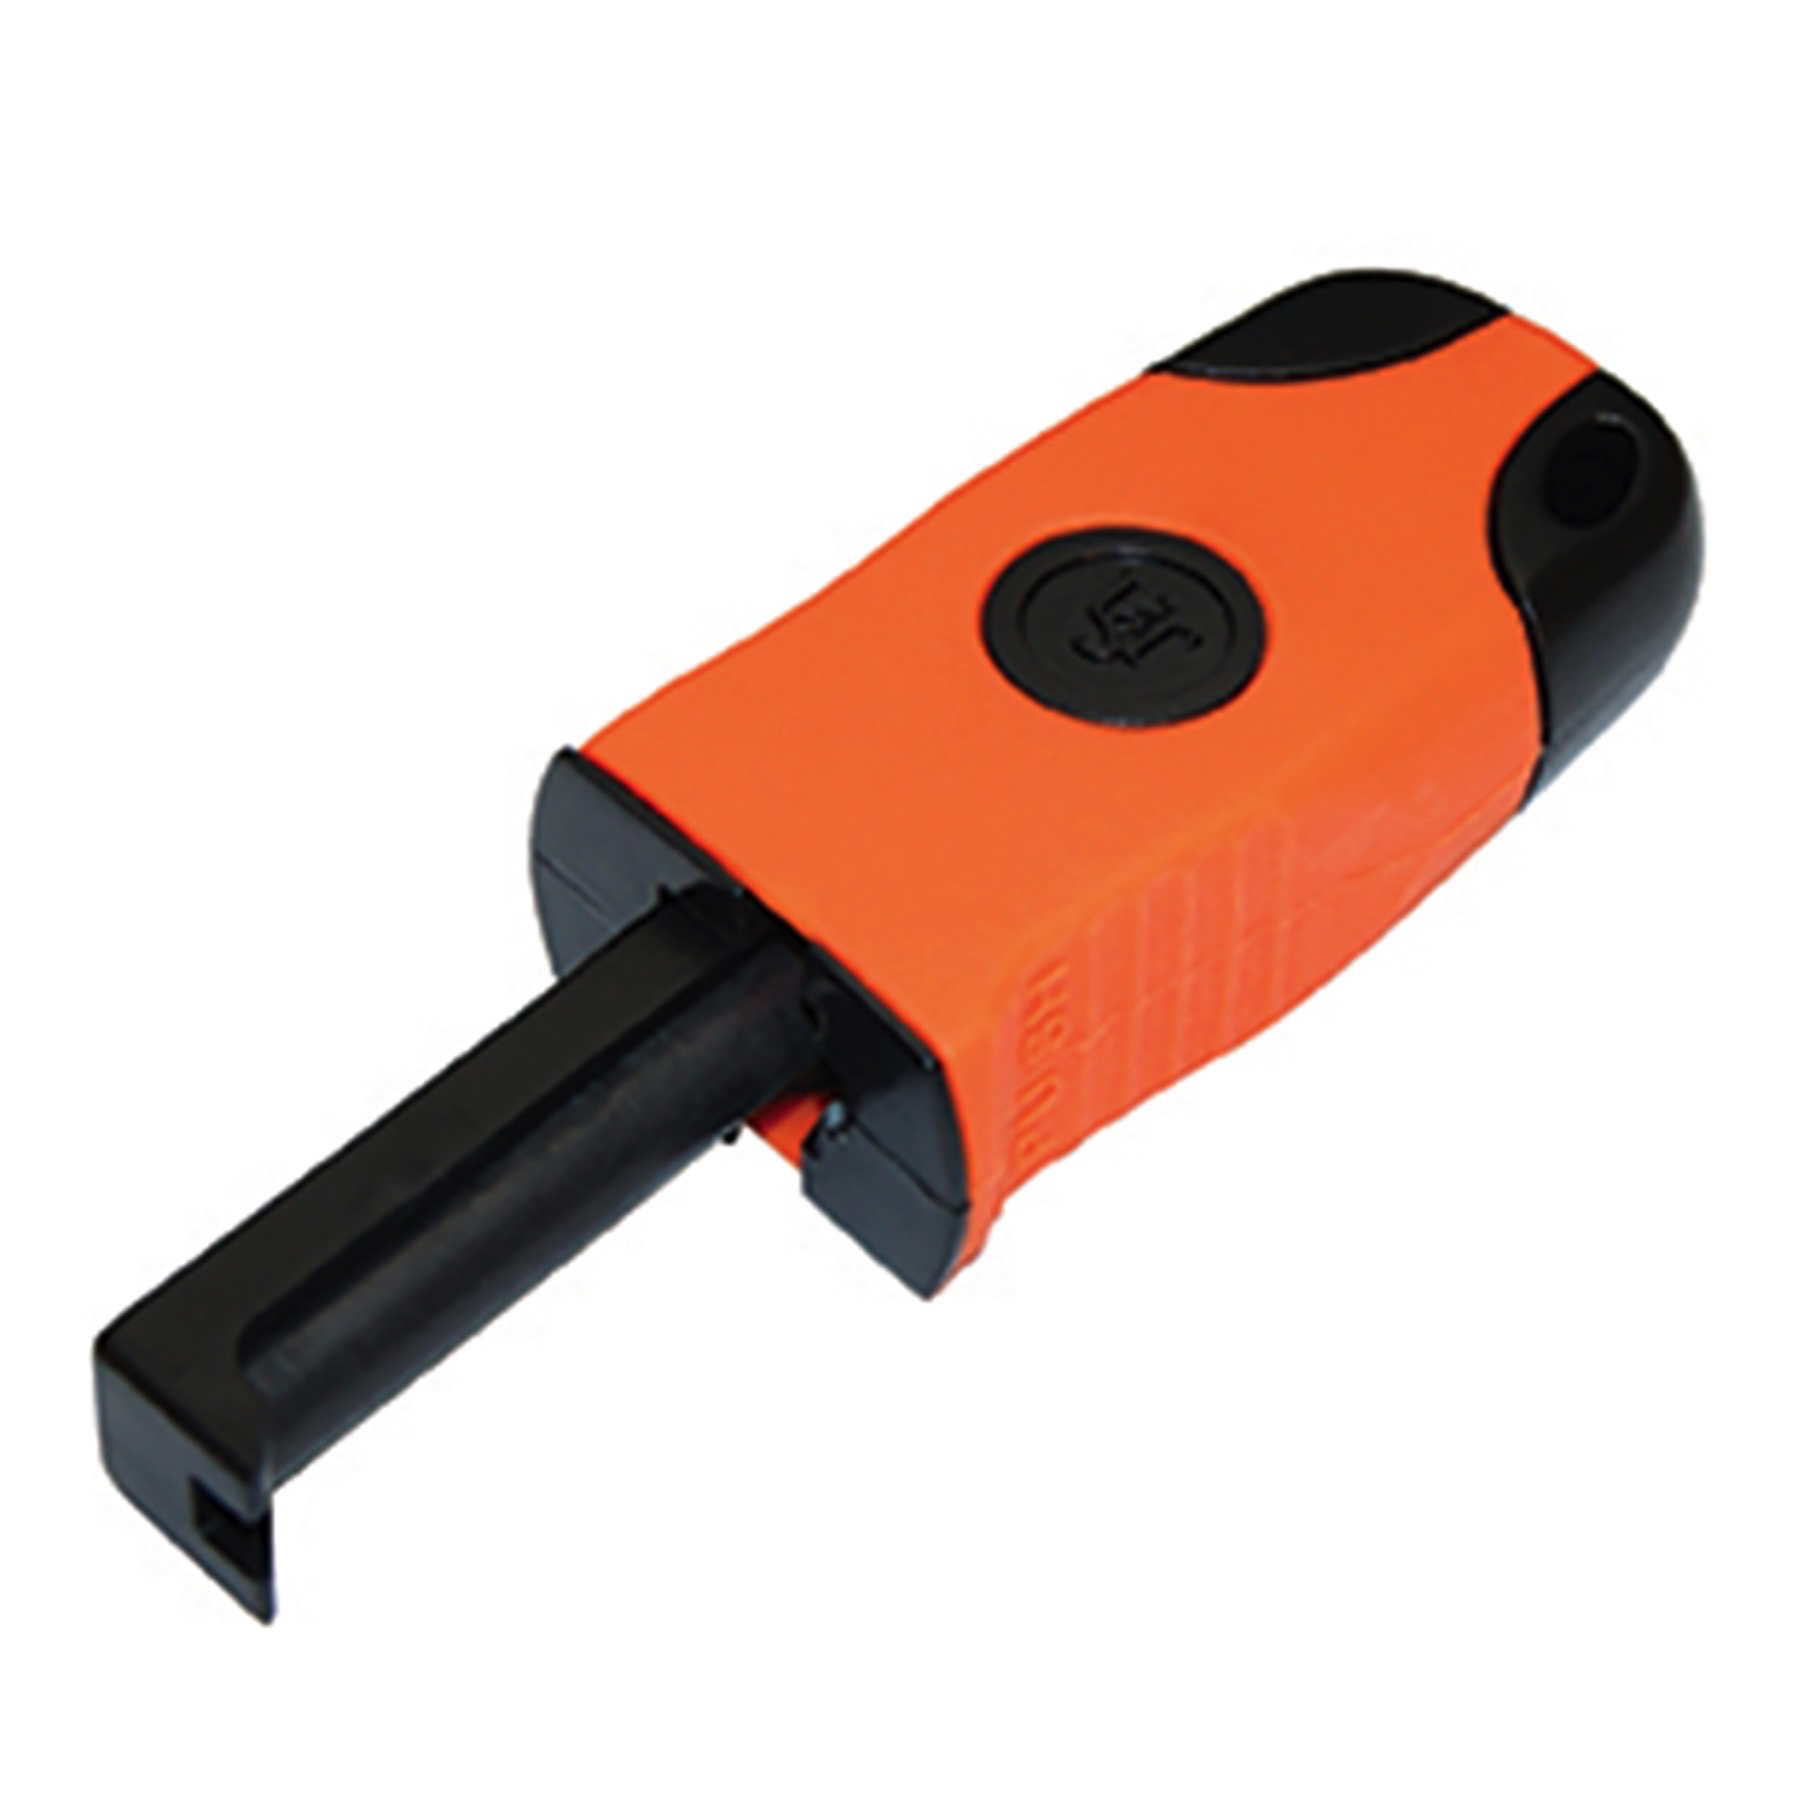 3-pack Ultimate Survival TECHNOLOGIES Micro sparkwheel Mini Flint Striker Fire